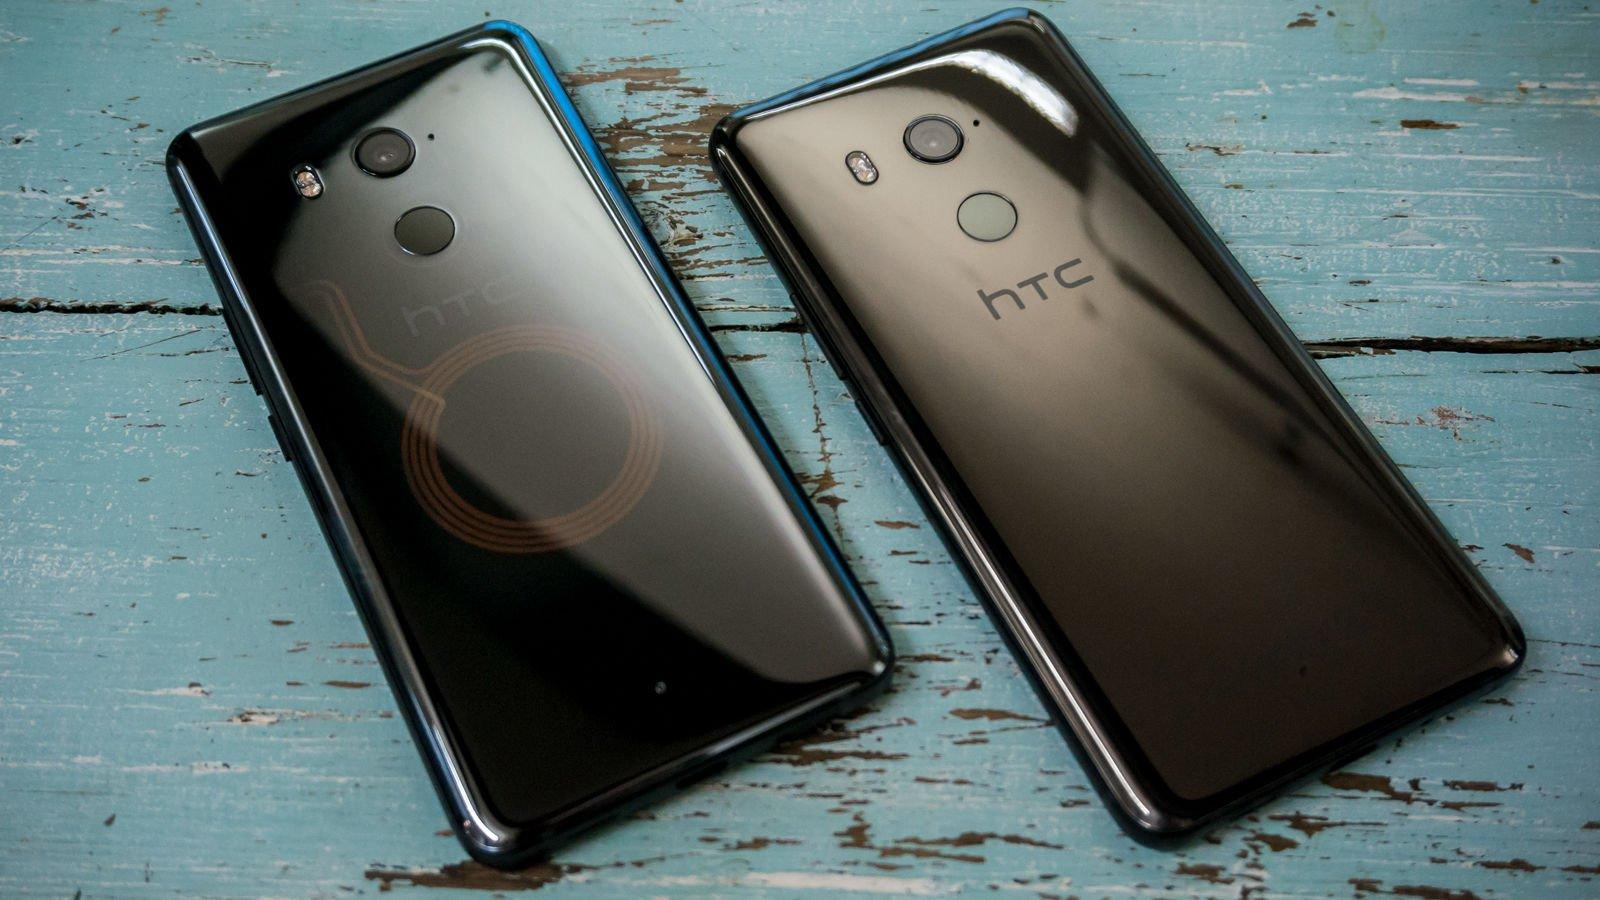 موبايل HTC u11 plusموبايل HTC u11 plus